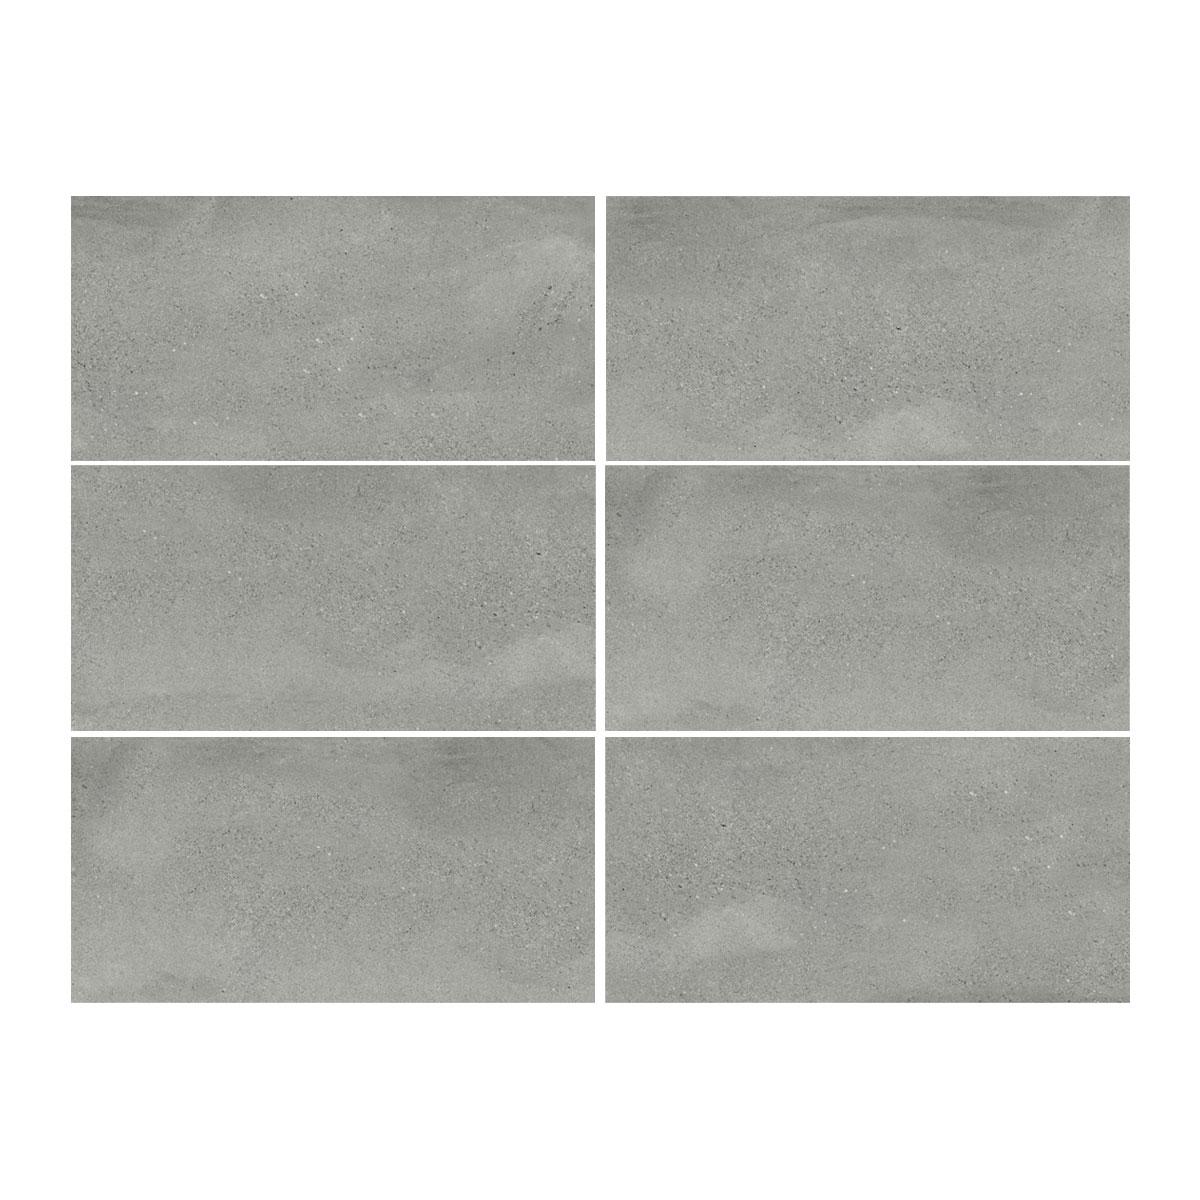 Moonstone - Steel - Concrete Look Tiles - 300x600mm - Stone3